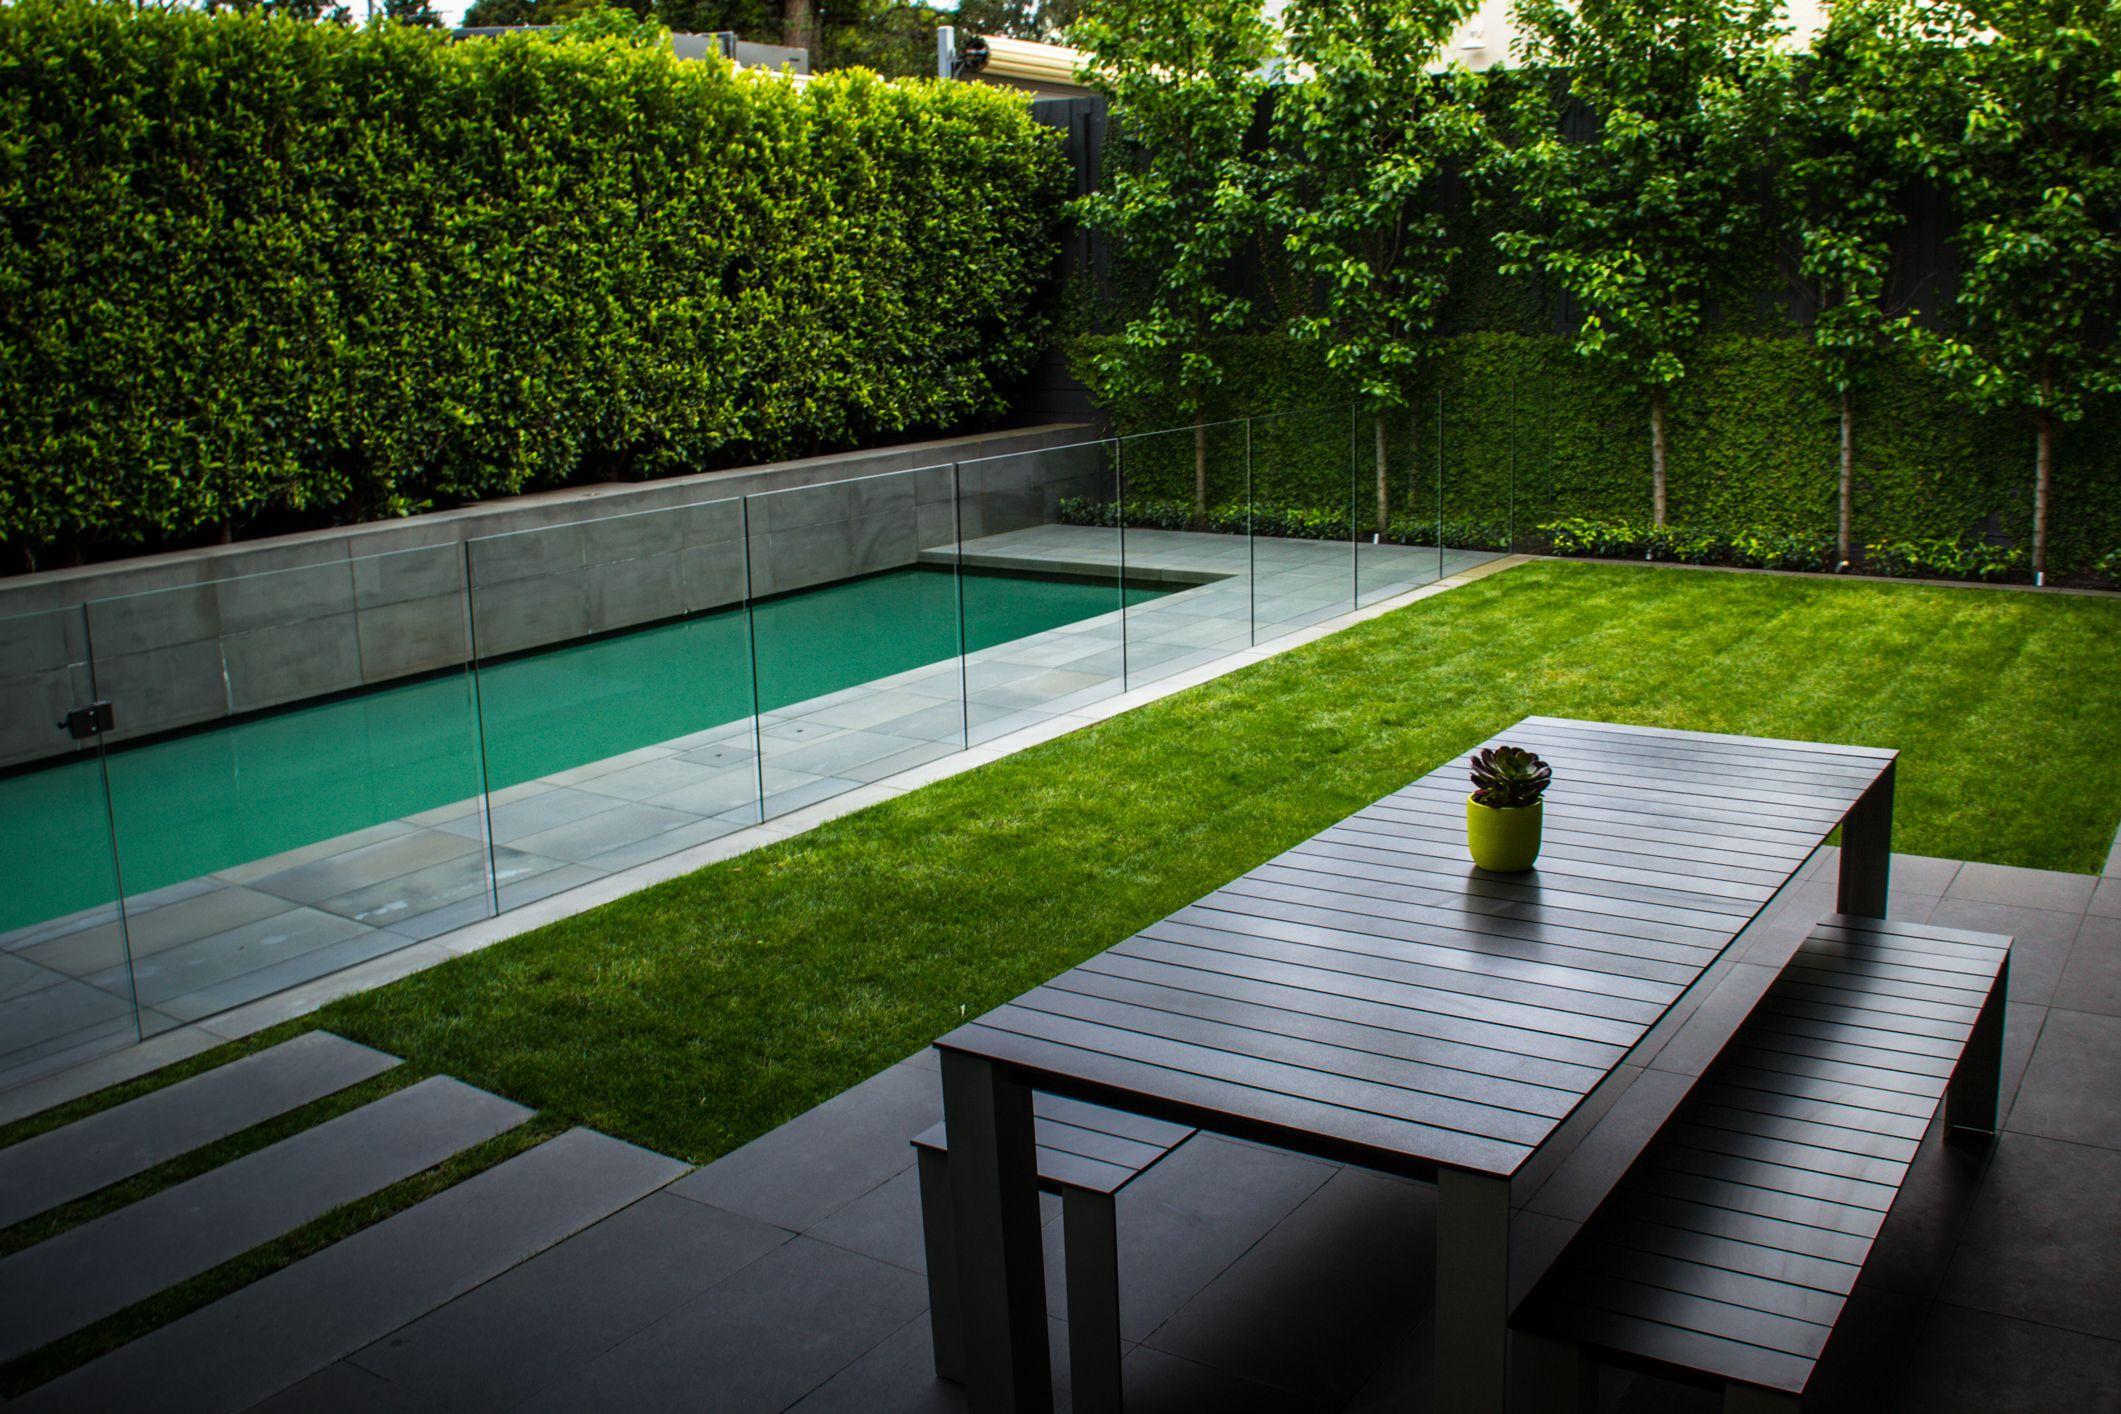 Www Canny Com Au Ph 03 8532 4444 Pools Ingroundpool Integratedpools Poollandscape Backyard Pool Landscaping Backyard Pool Backyard